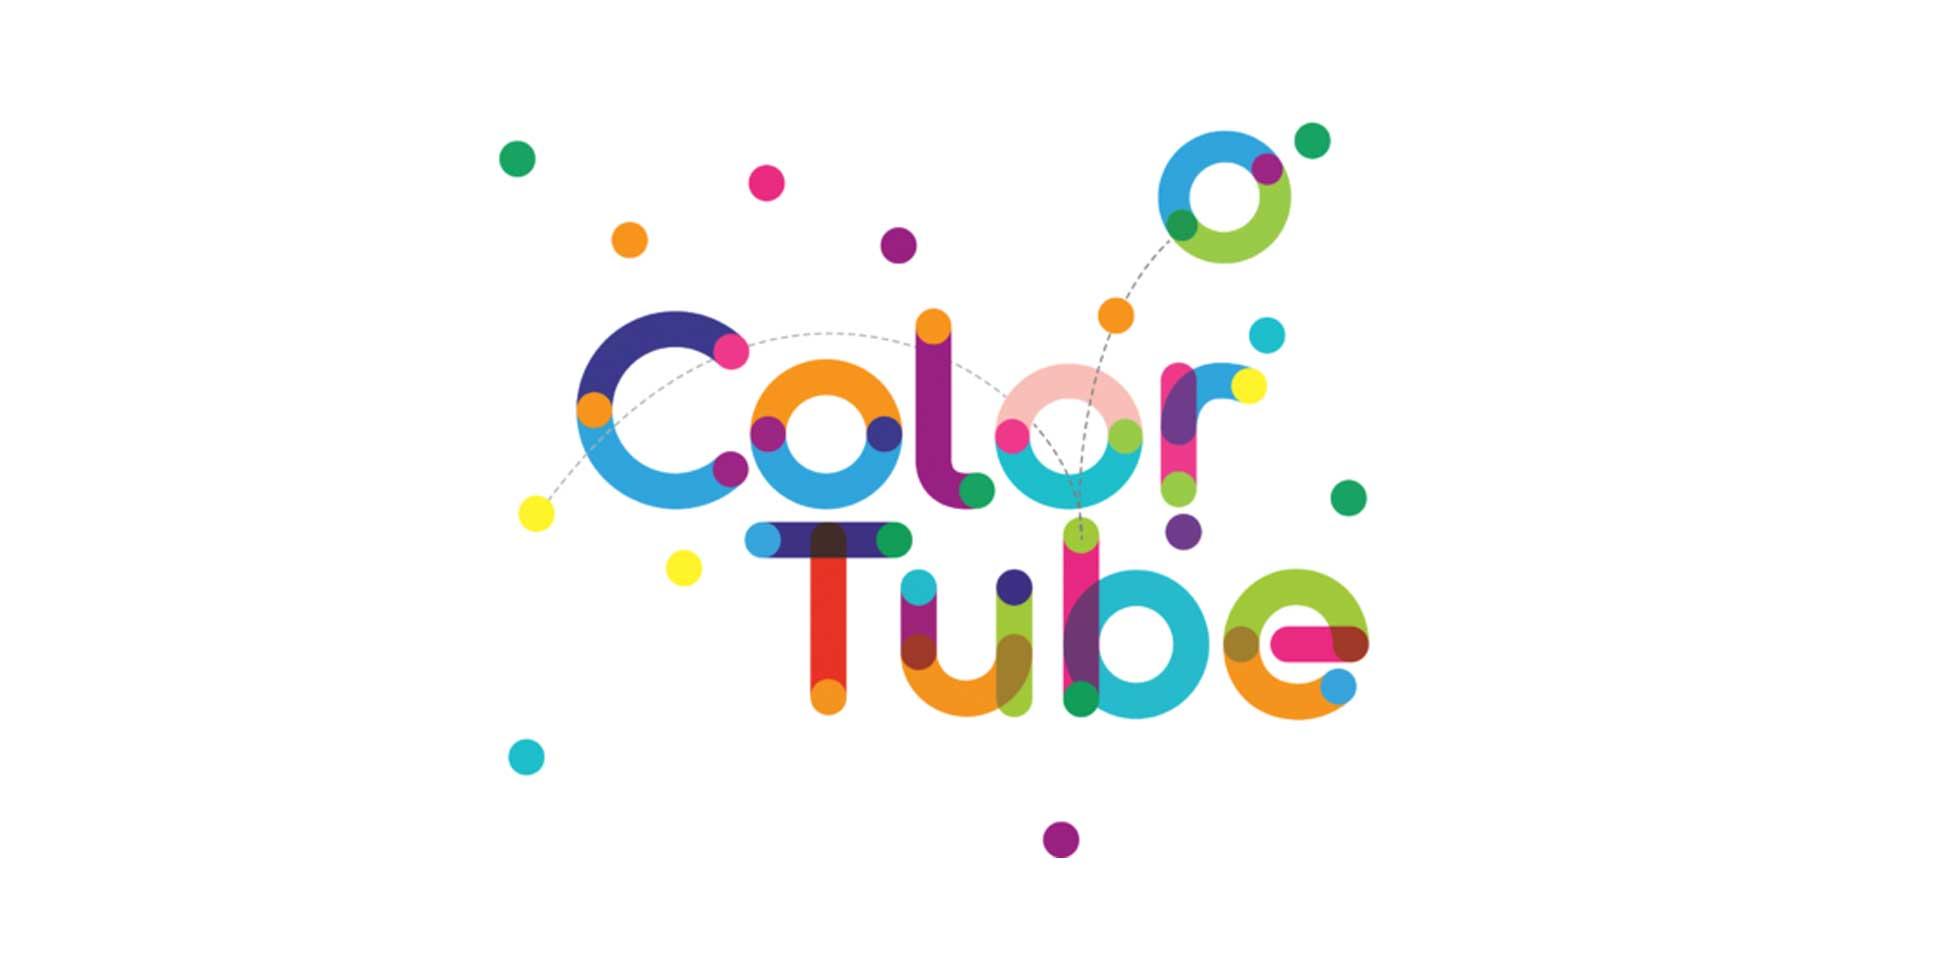 Free Download: ColorTube Font